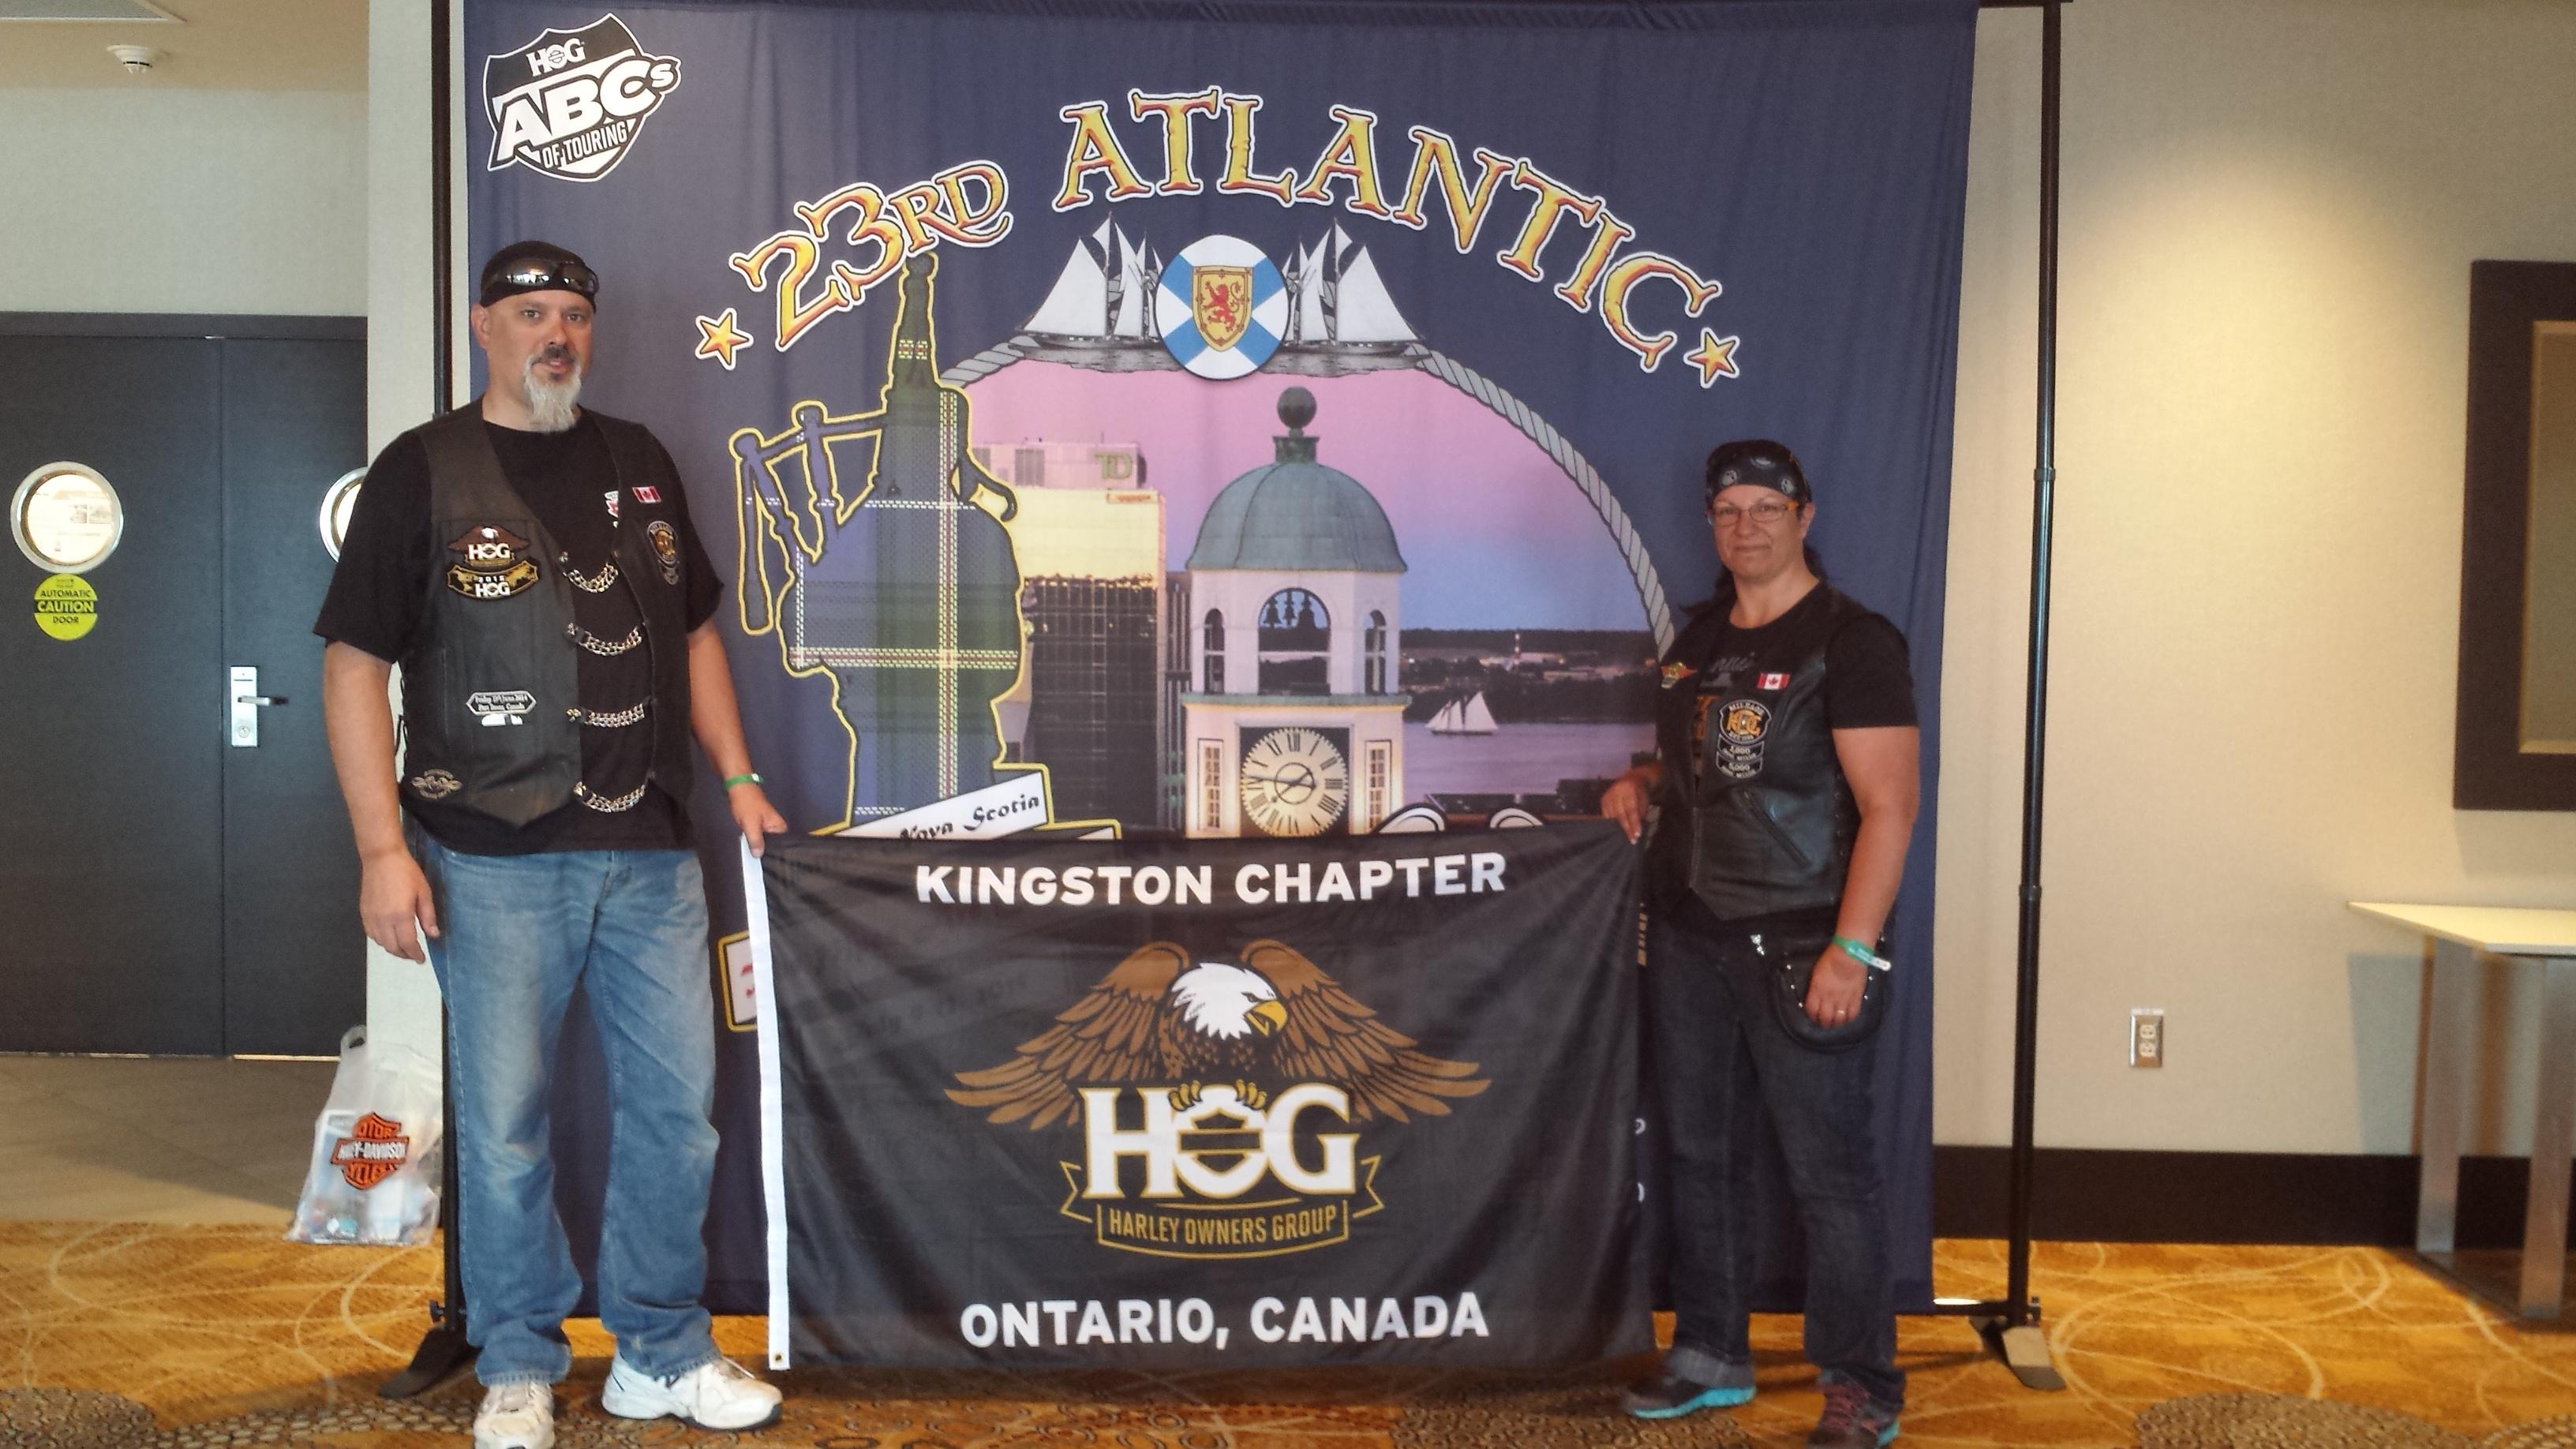 Atlantic HOG Rally 2015